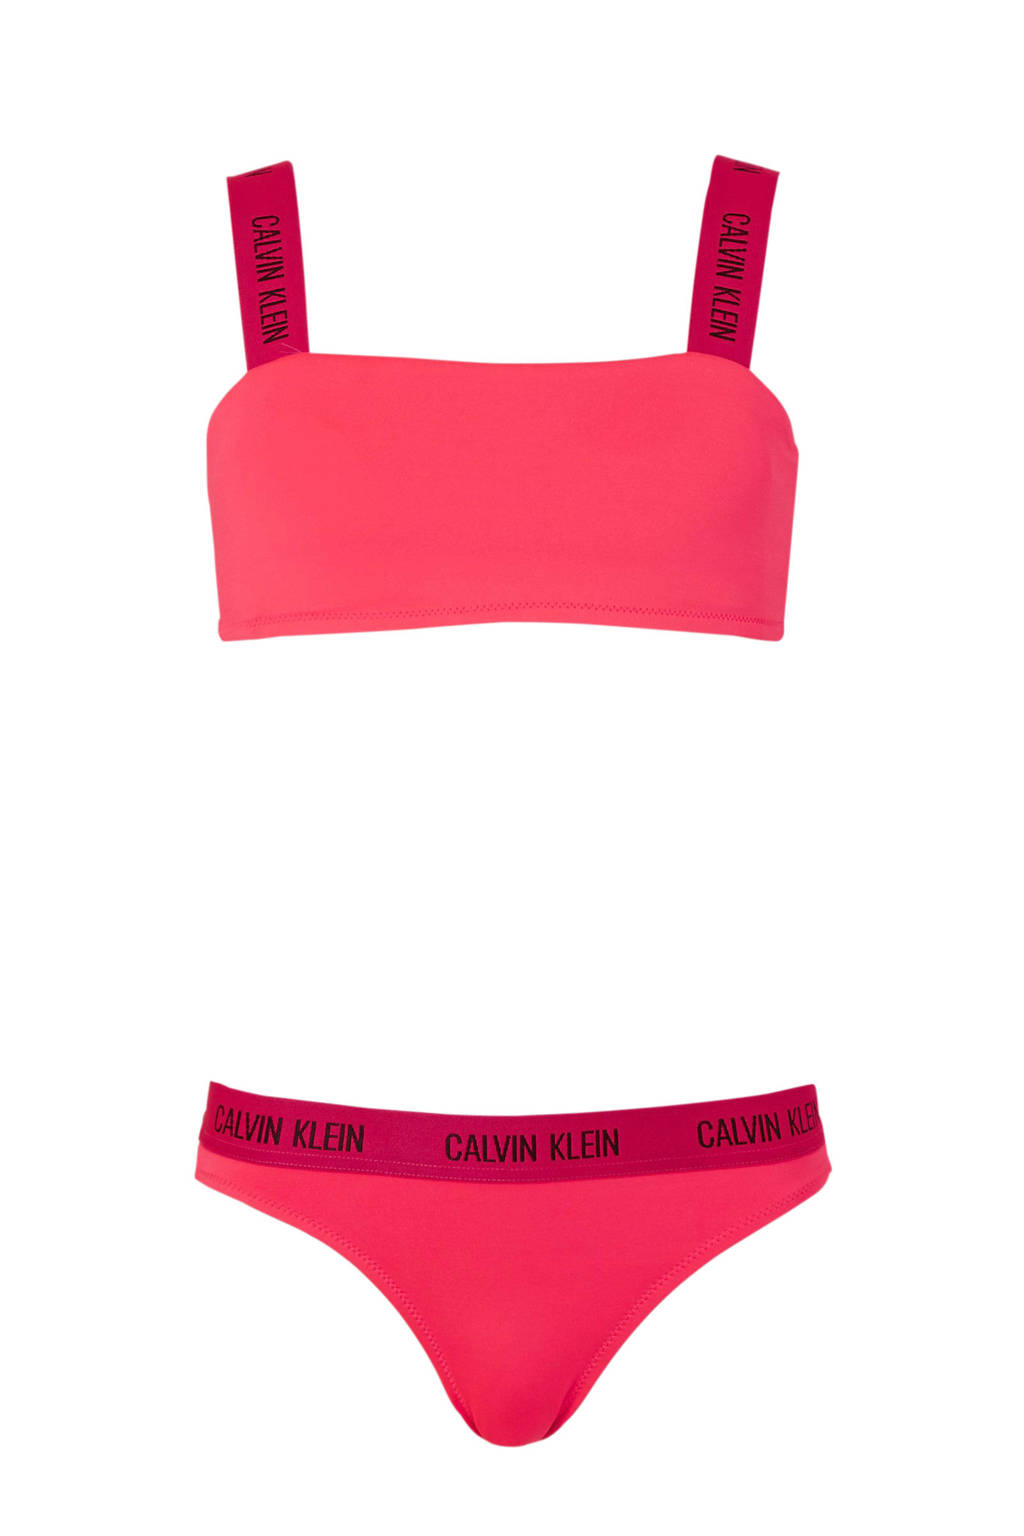 Calvin Klein bandeau bikini fluor roze, fluorroze